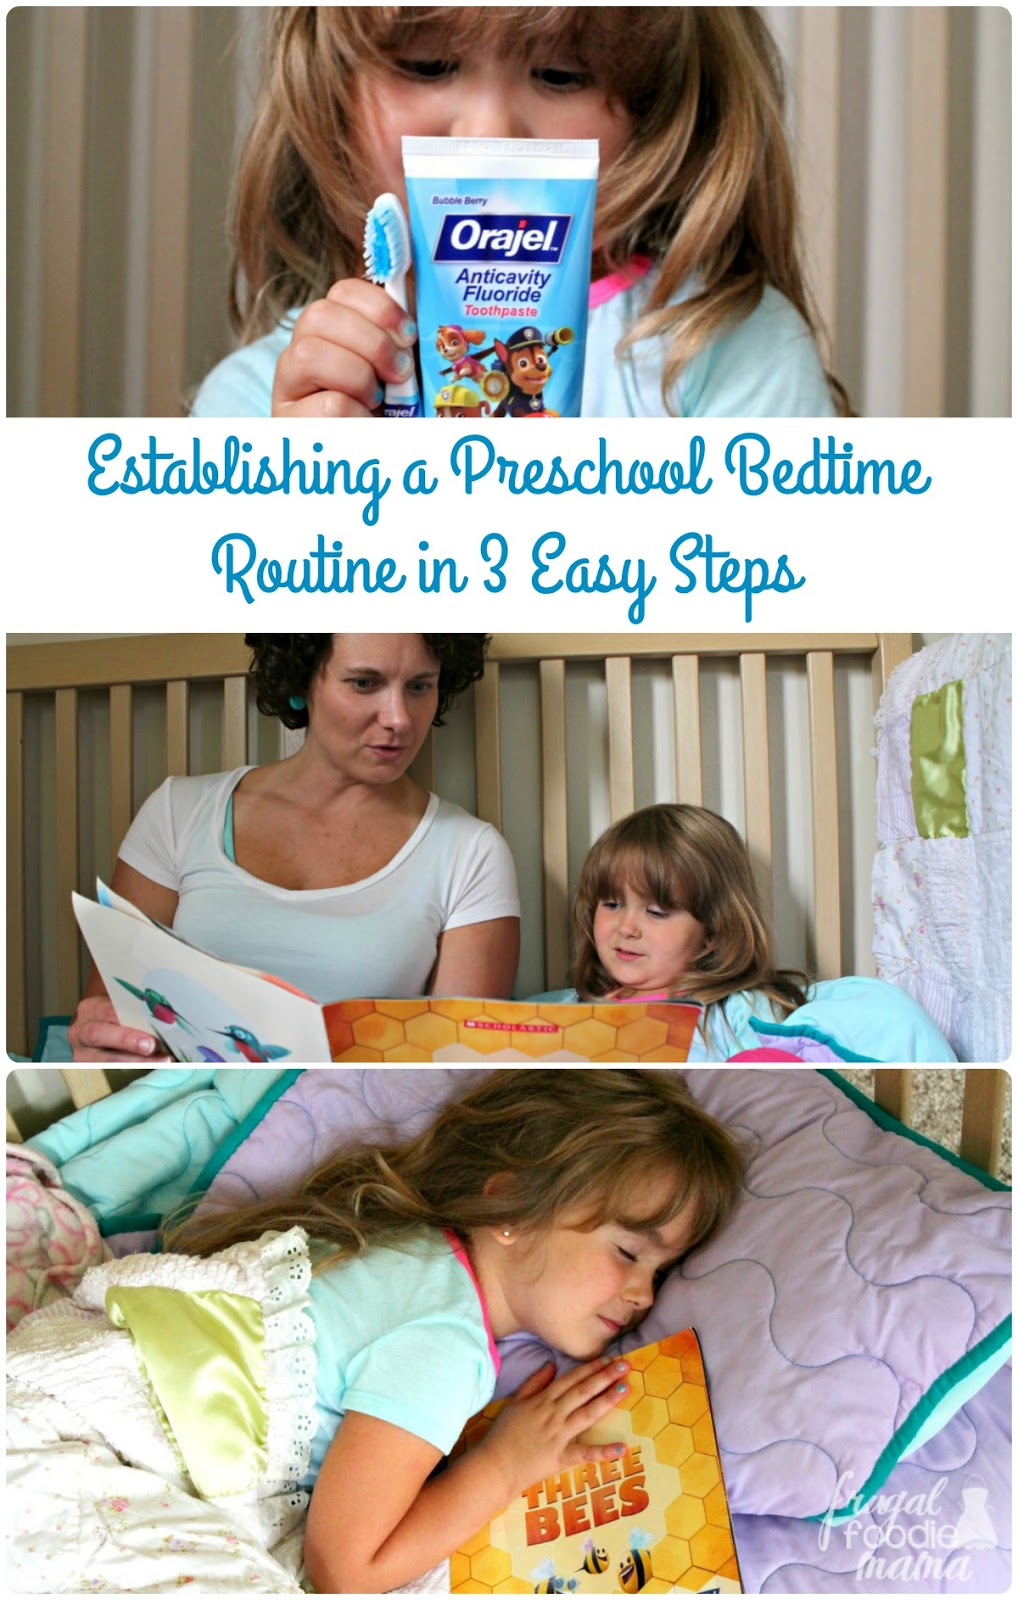 Establishing A Seasonal Capsule Part 1: Frugal Foodie Mama: Establishing A Preschool Bedtime